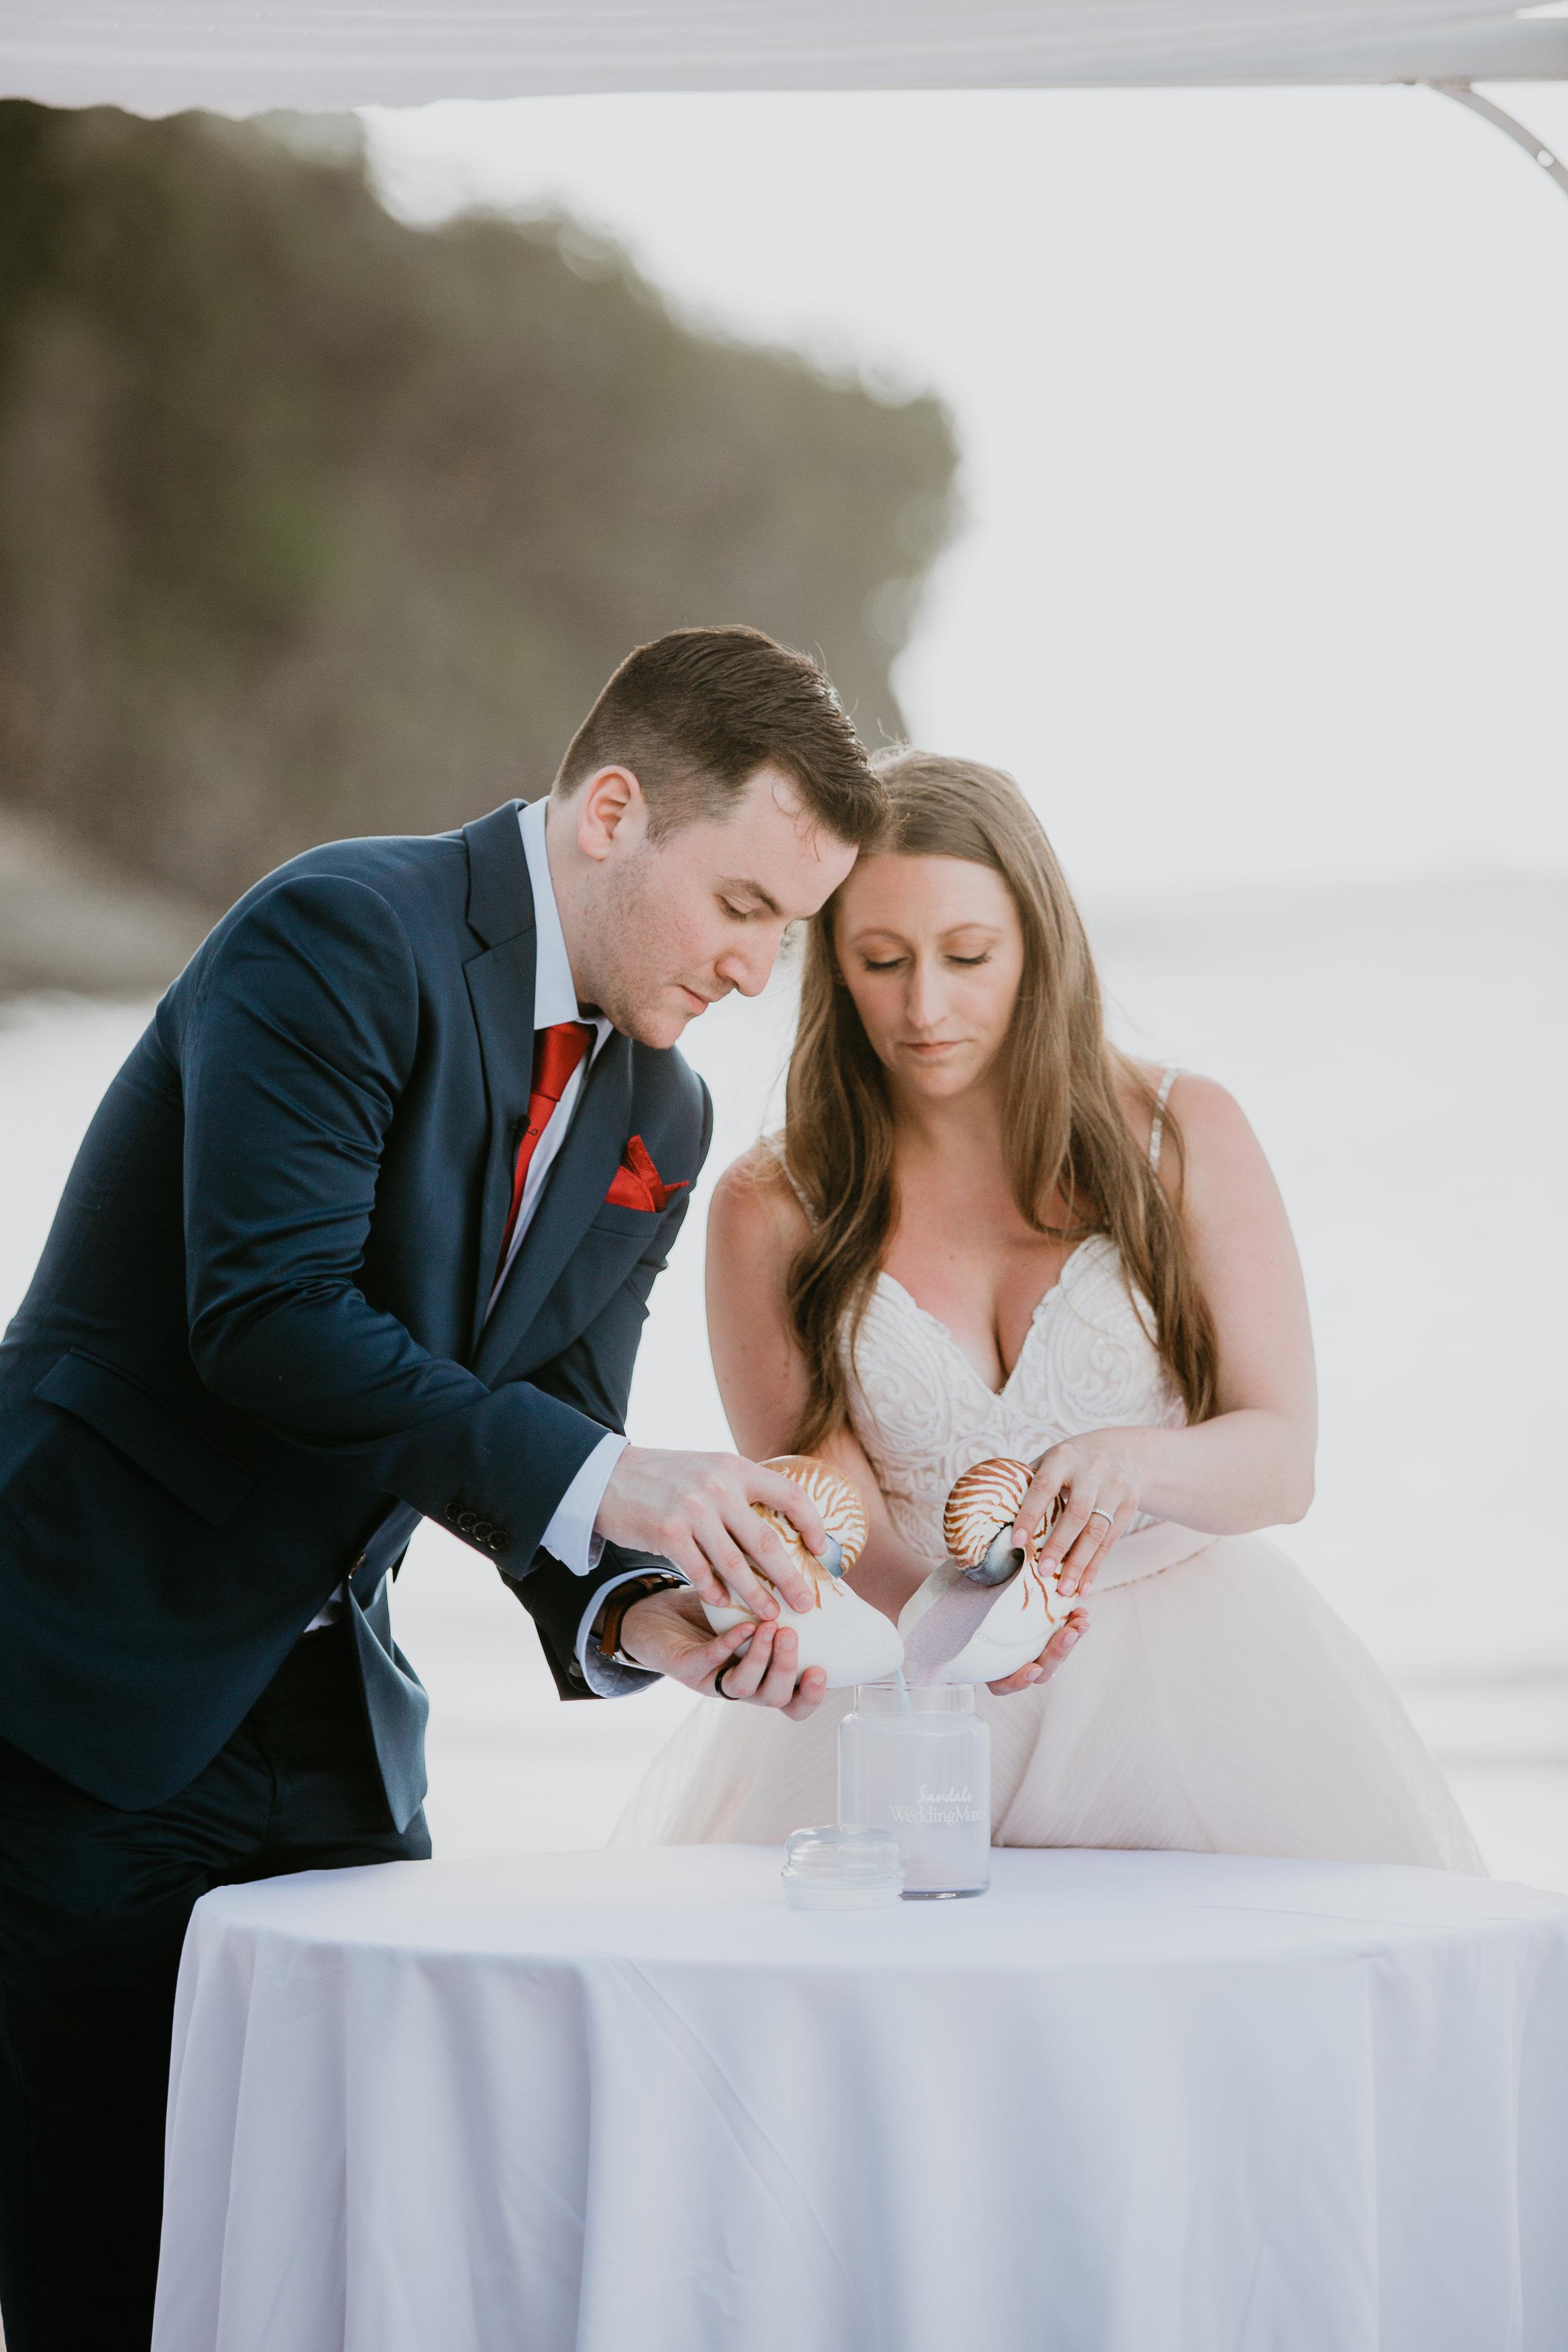 nicole-daacke-photography-destination-wedding-in-st-lucia-sandals-la-toc-intimate-island-wedding-carribean-elopement-photographer-chill-island-wedding-70.jpg